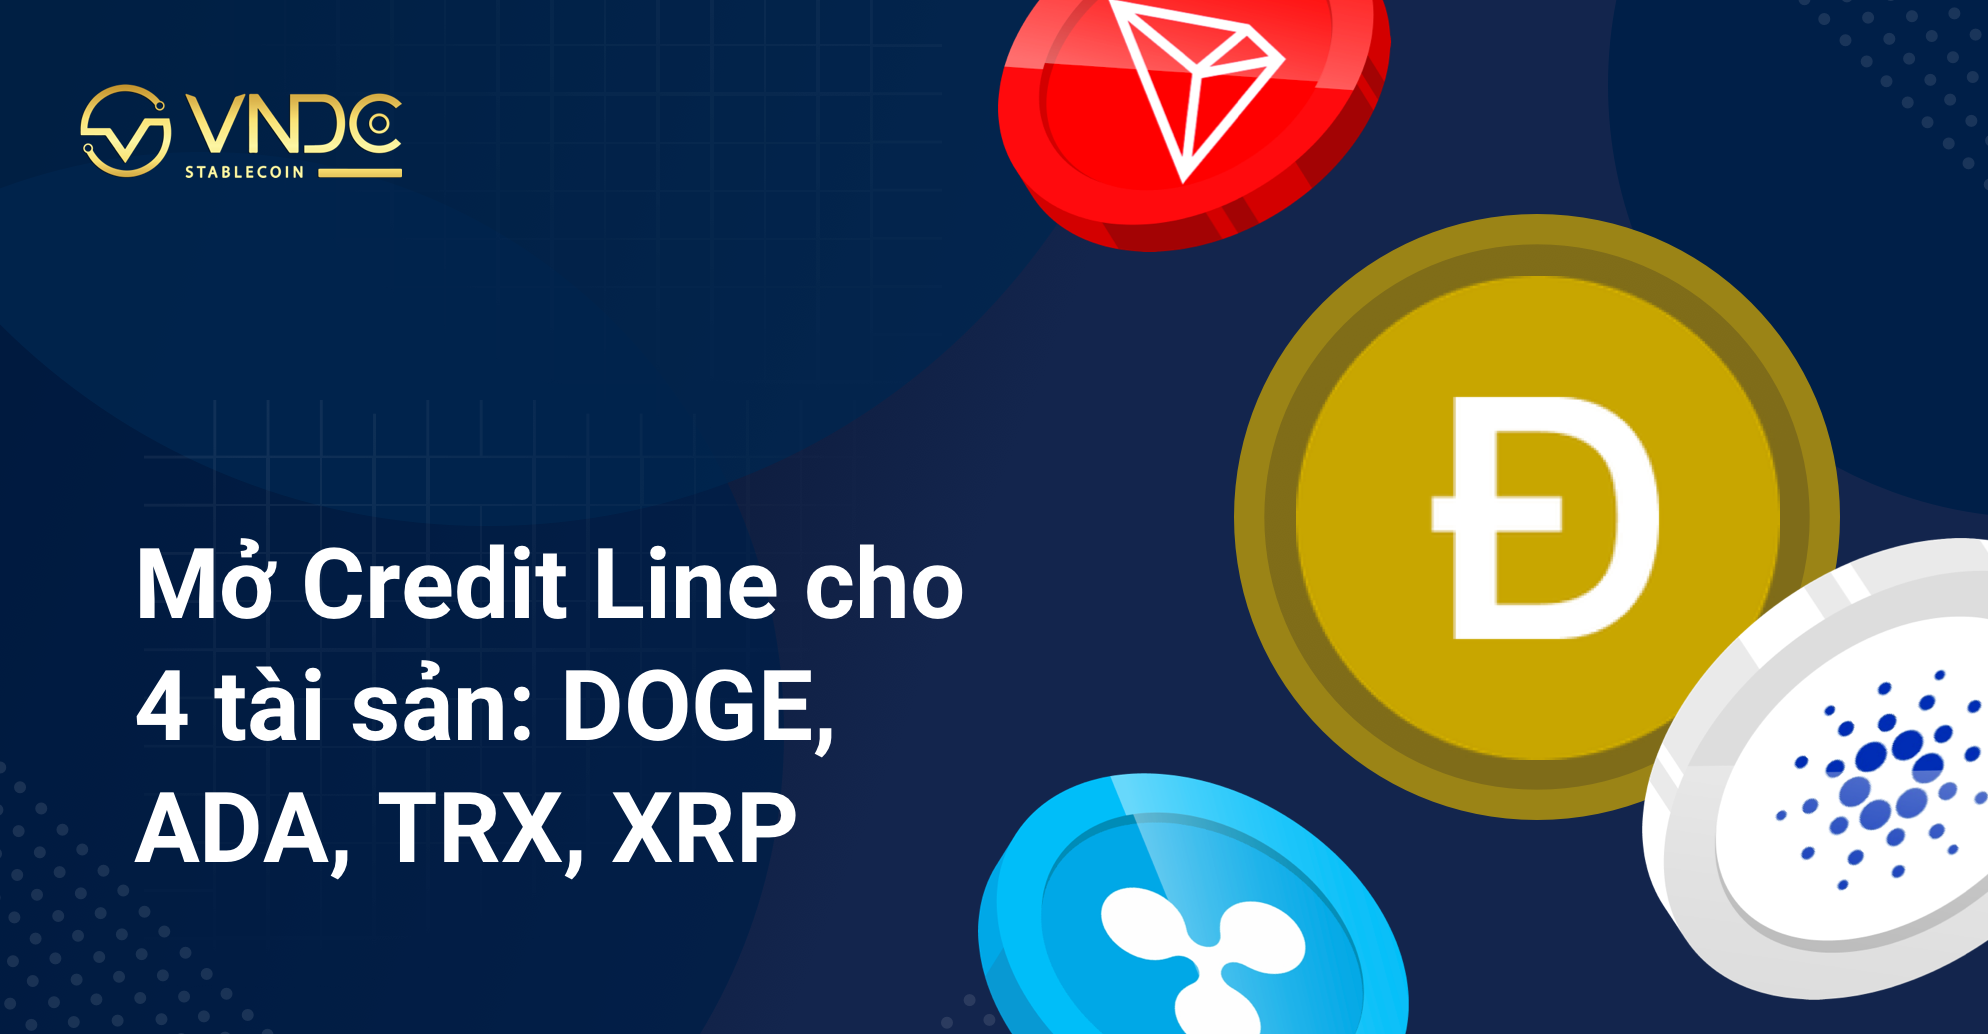 Mở Credit Line cho 4 tài sản: DOGE, ADA, TRX, XRP